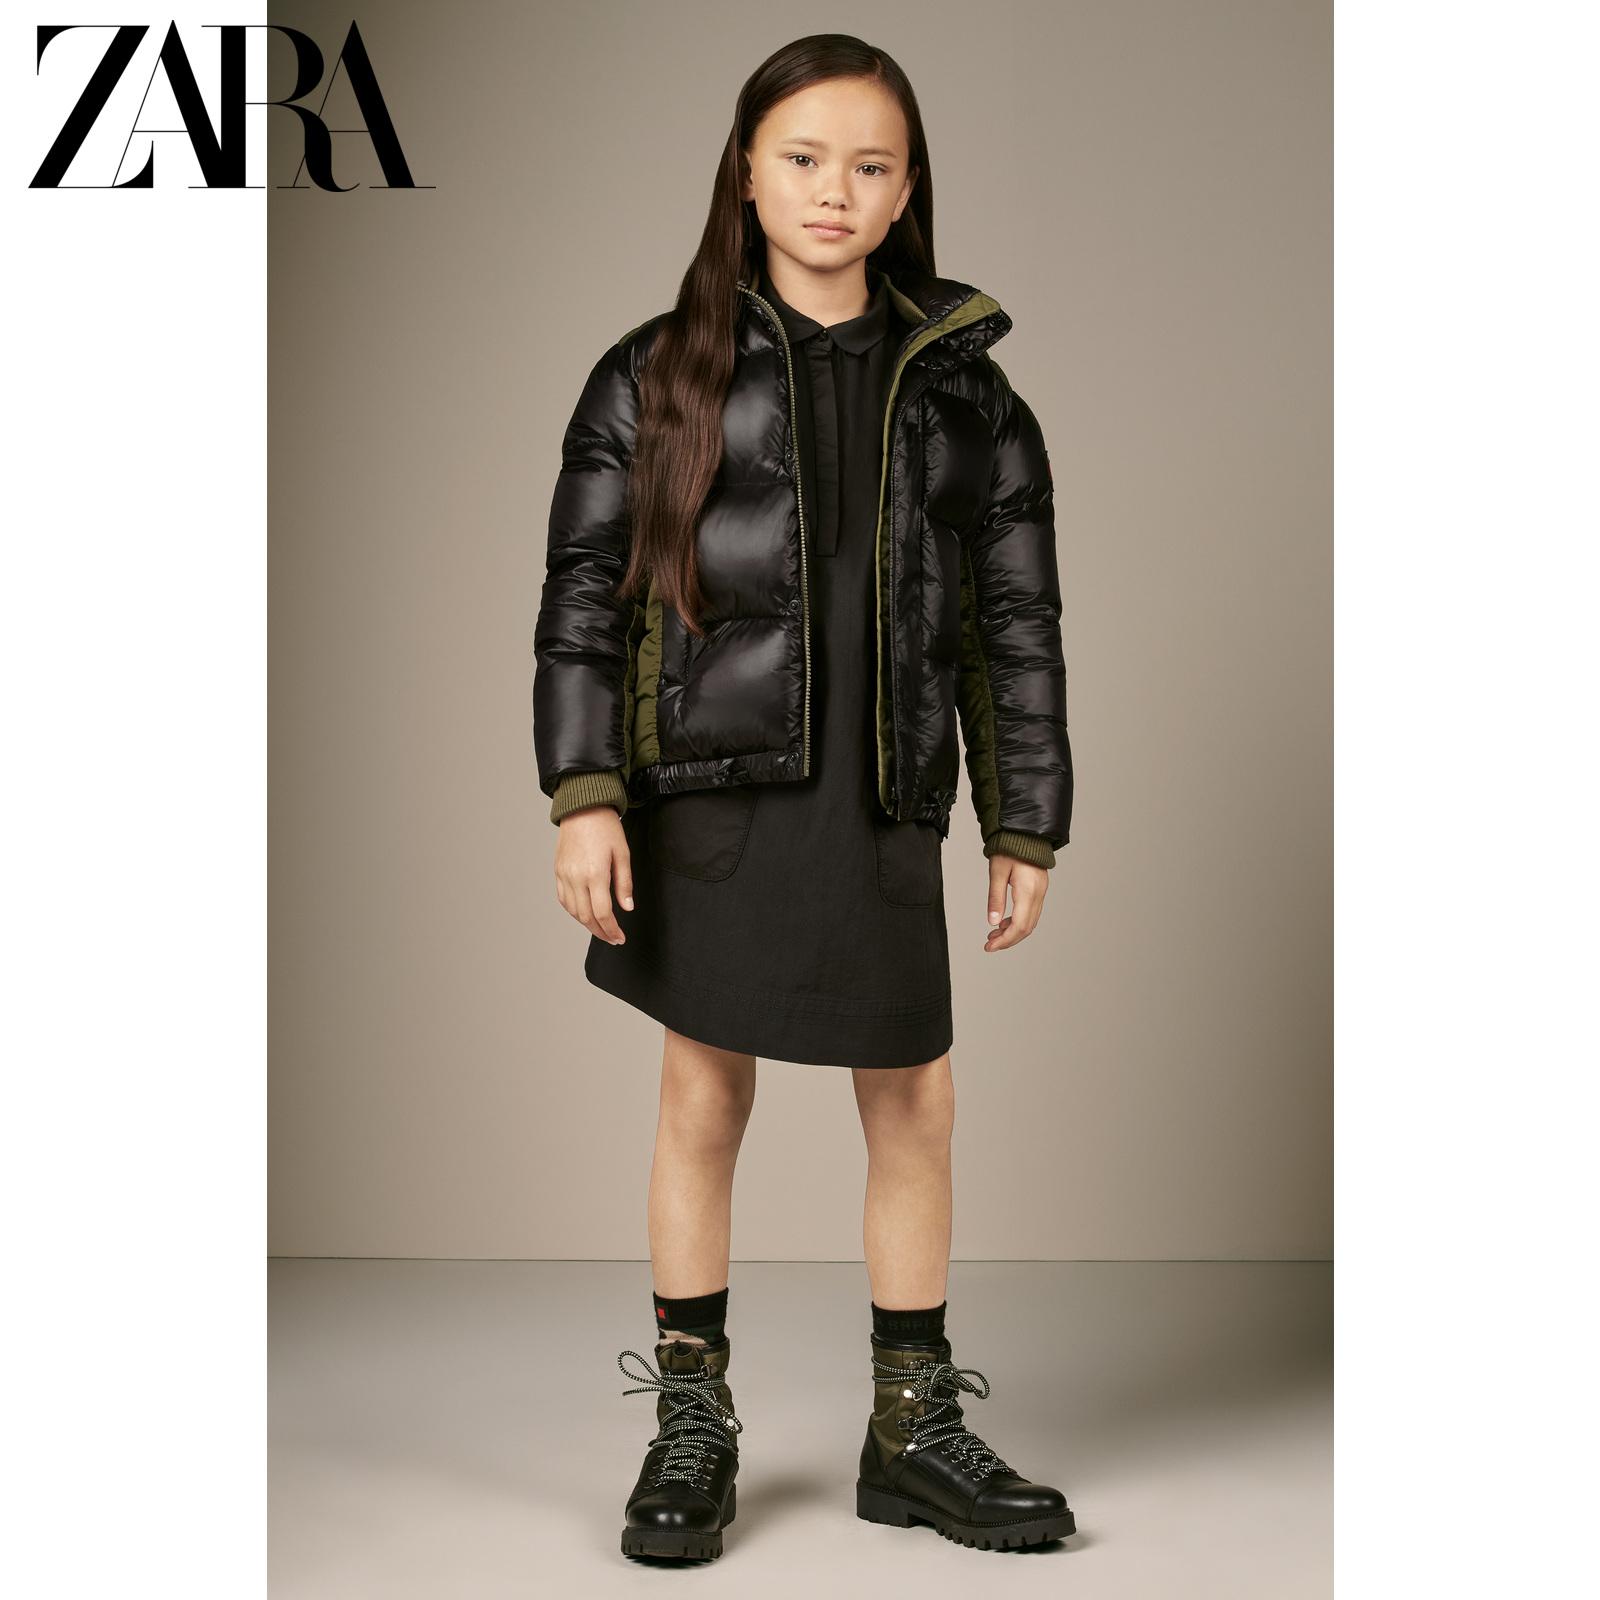 ZARA新款 童装女童 黑色棉质连衣裙 06443037800,降价幅度72.4%